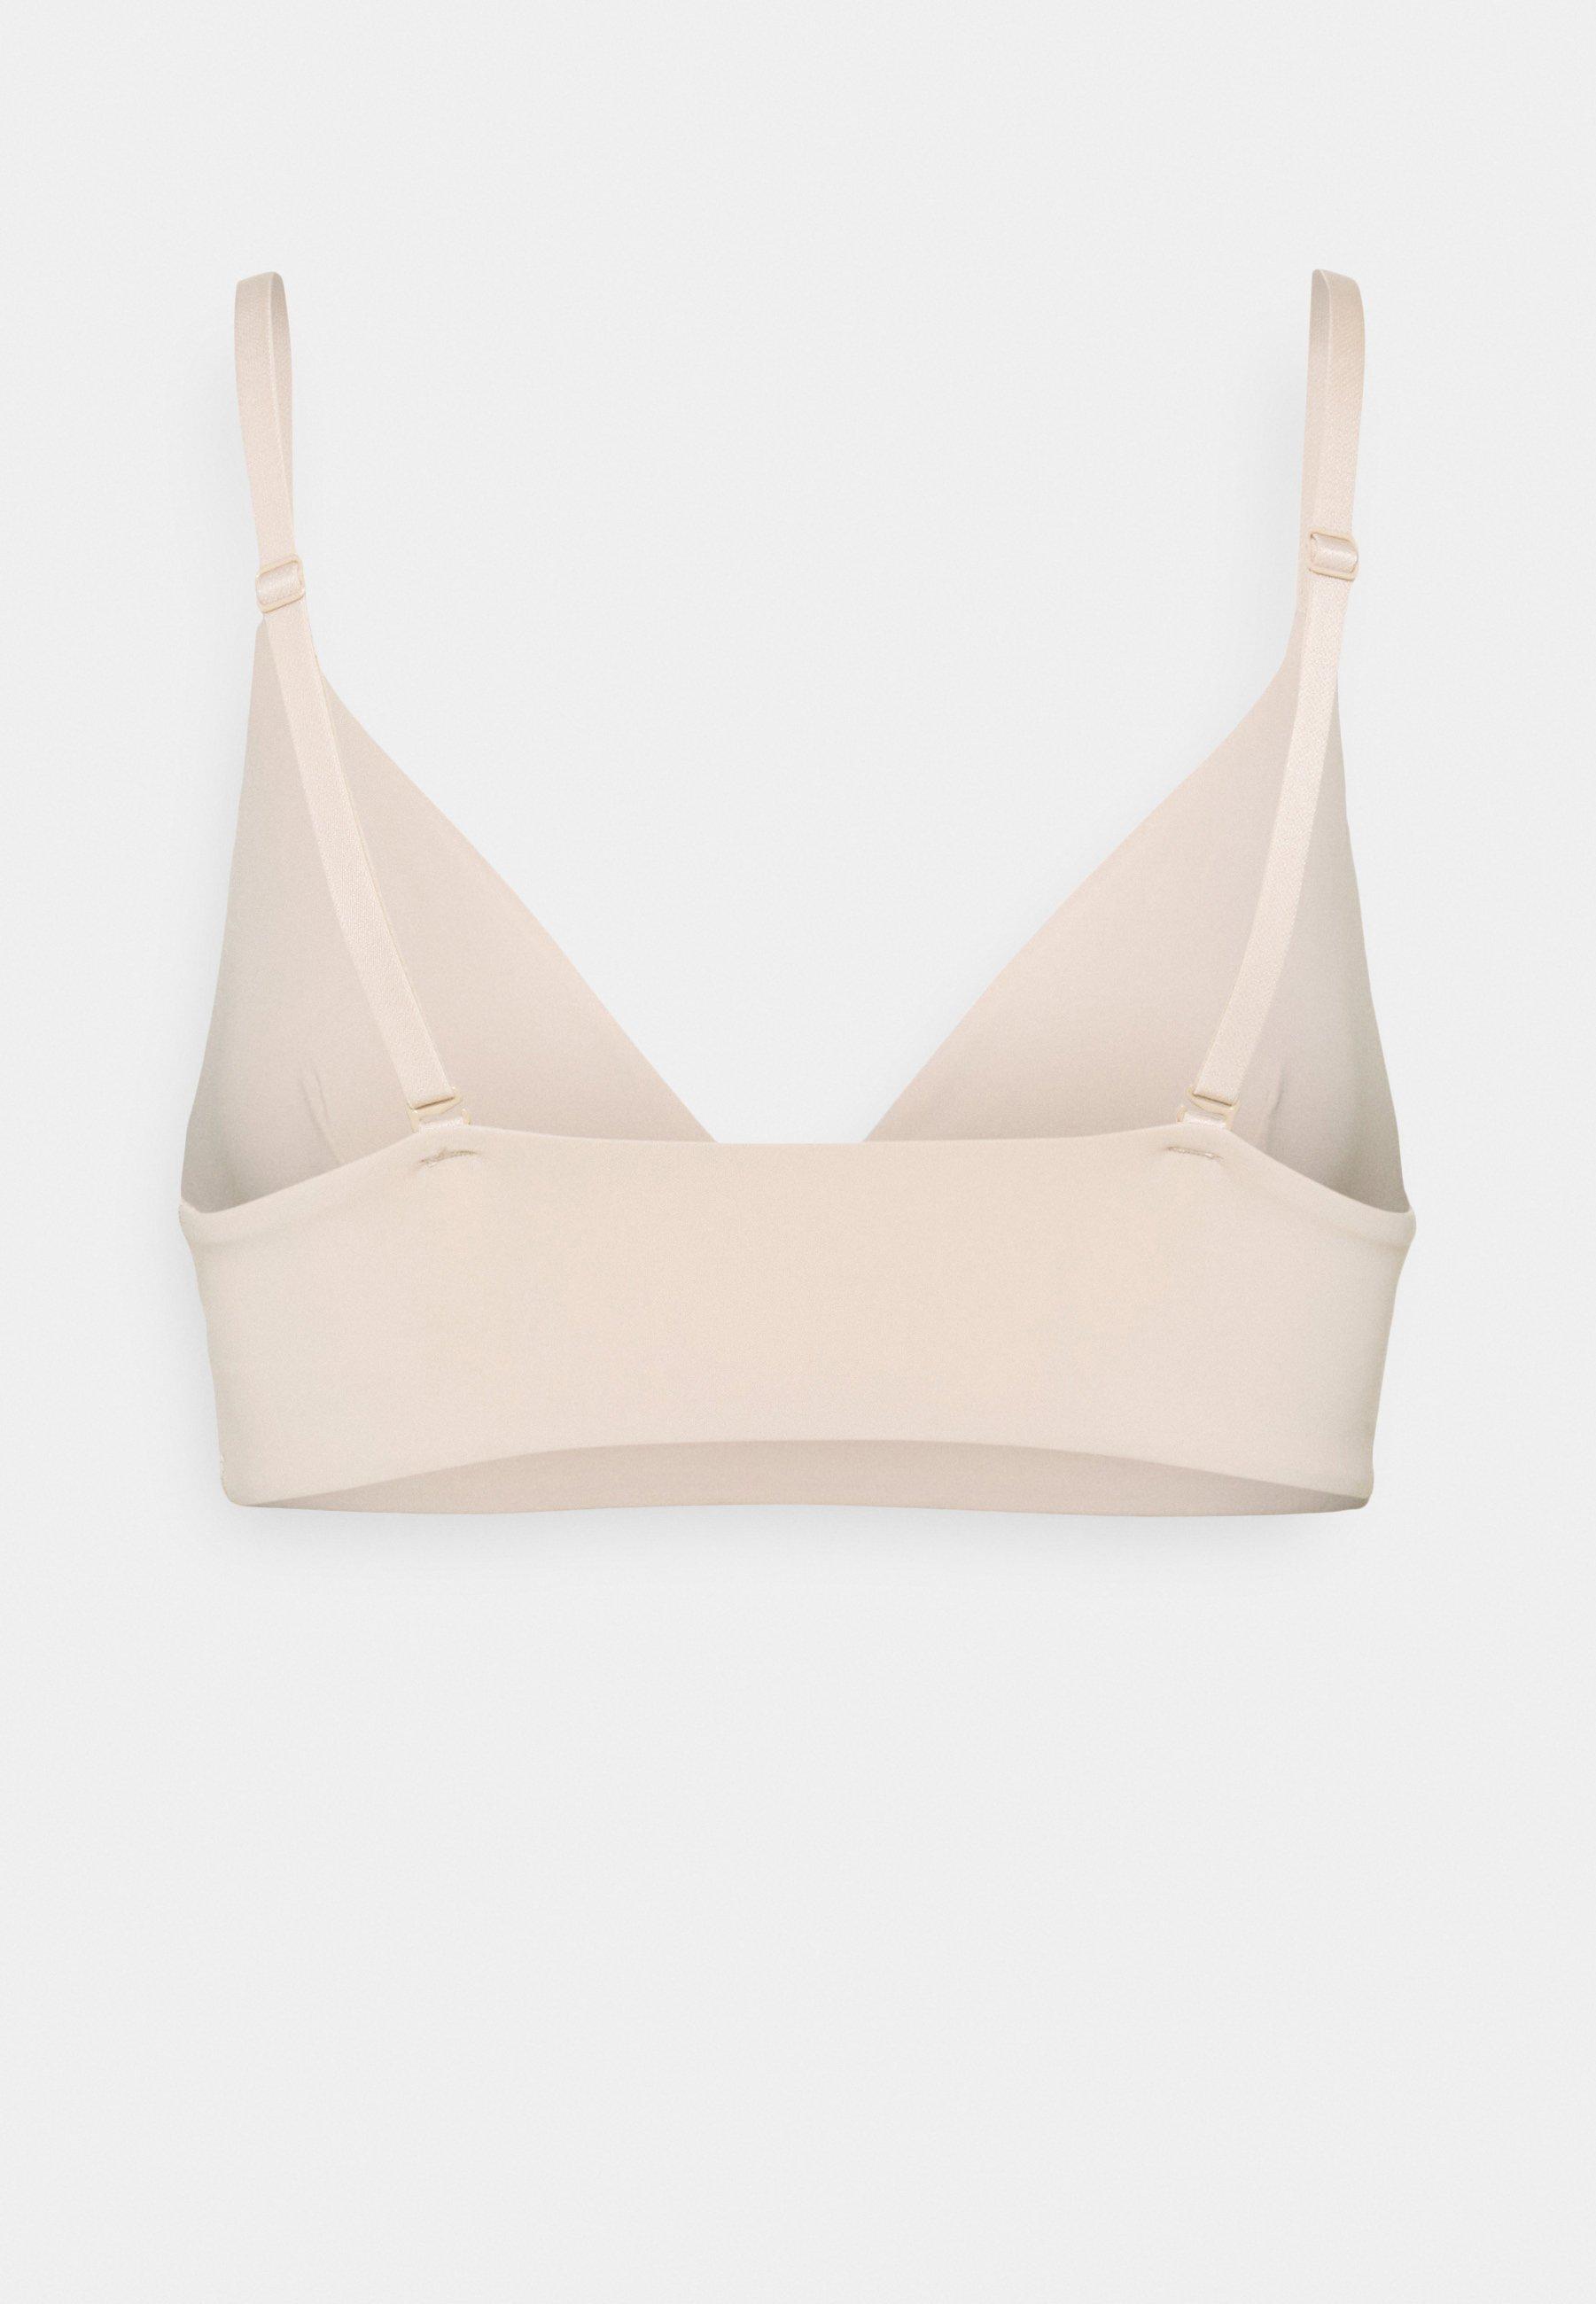 Femme 3 PACK - Soutien-gorge triangle